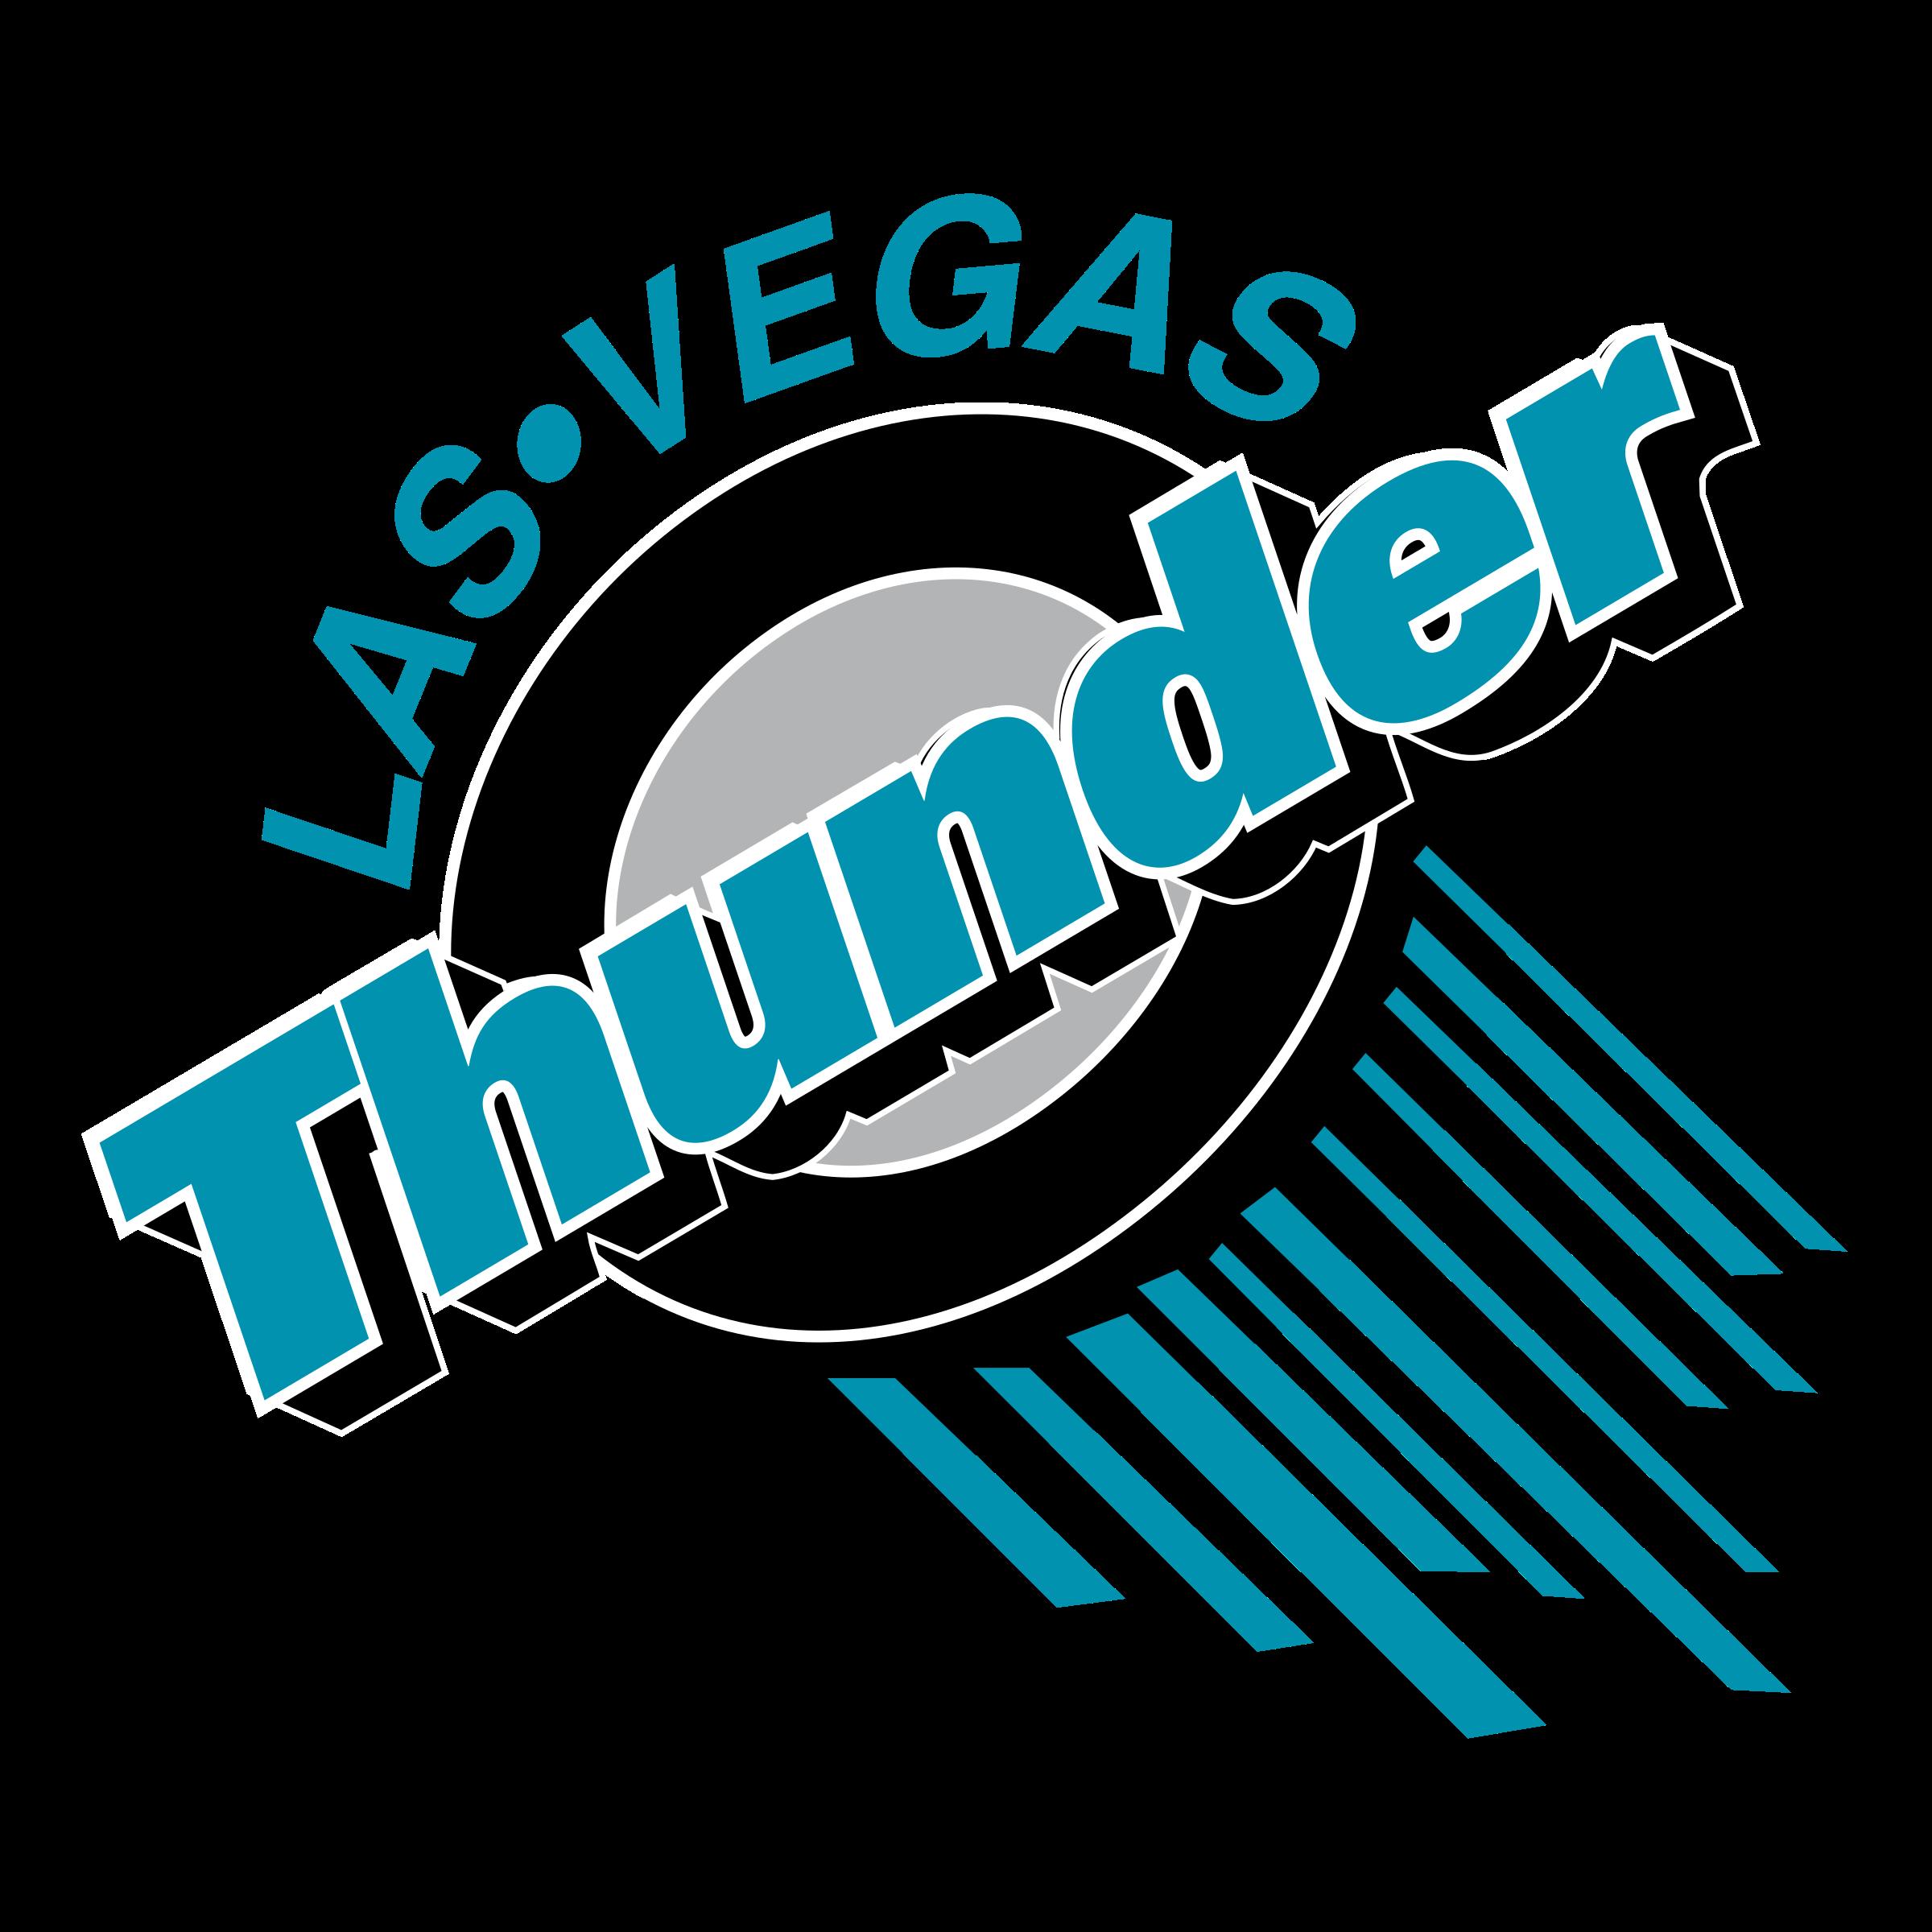 Thunder logo png transparent. Las vegas clipart sketch